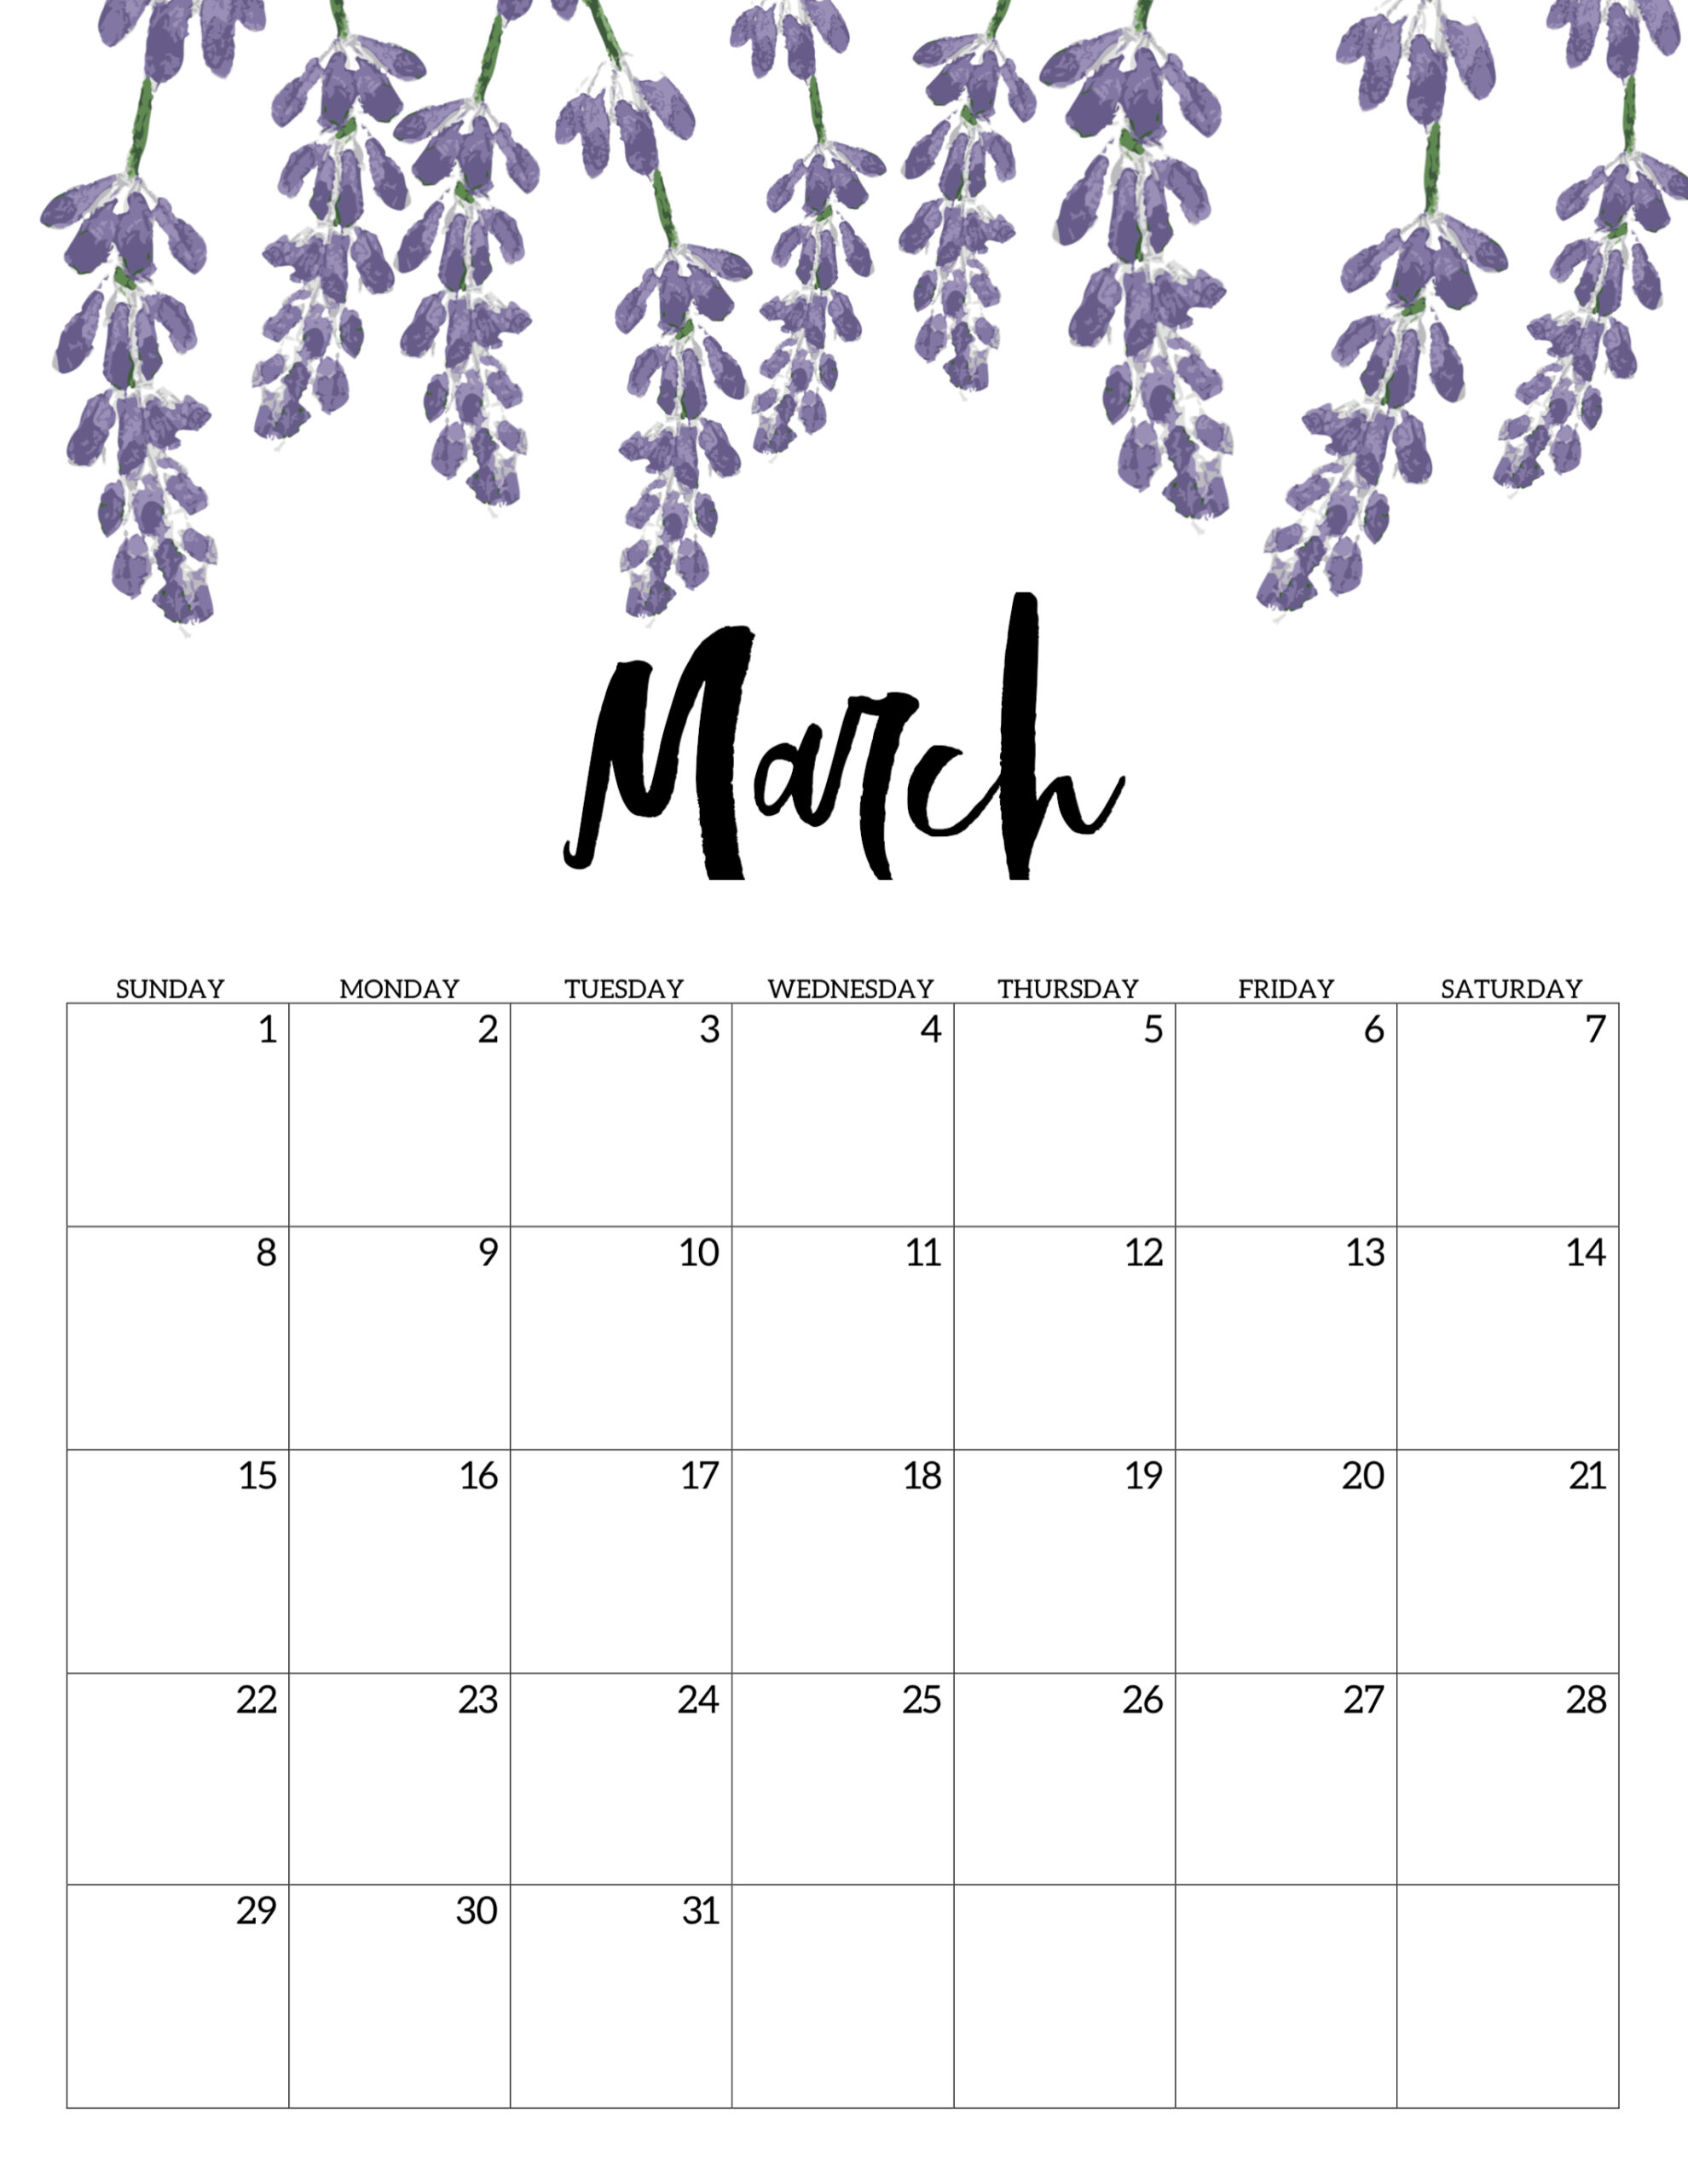 Free Printable March 2020 Calendar.Free Printable Calendar 2020 Floral Paper Trail Design